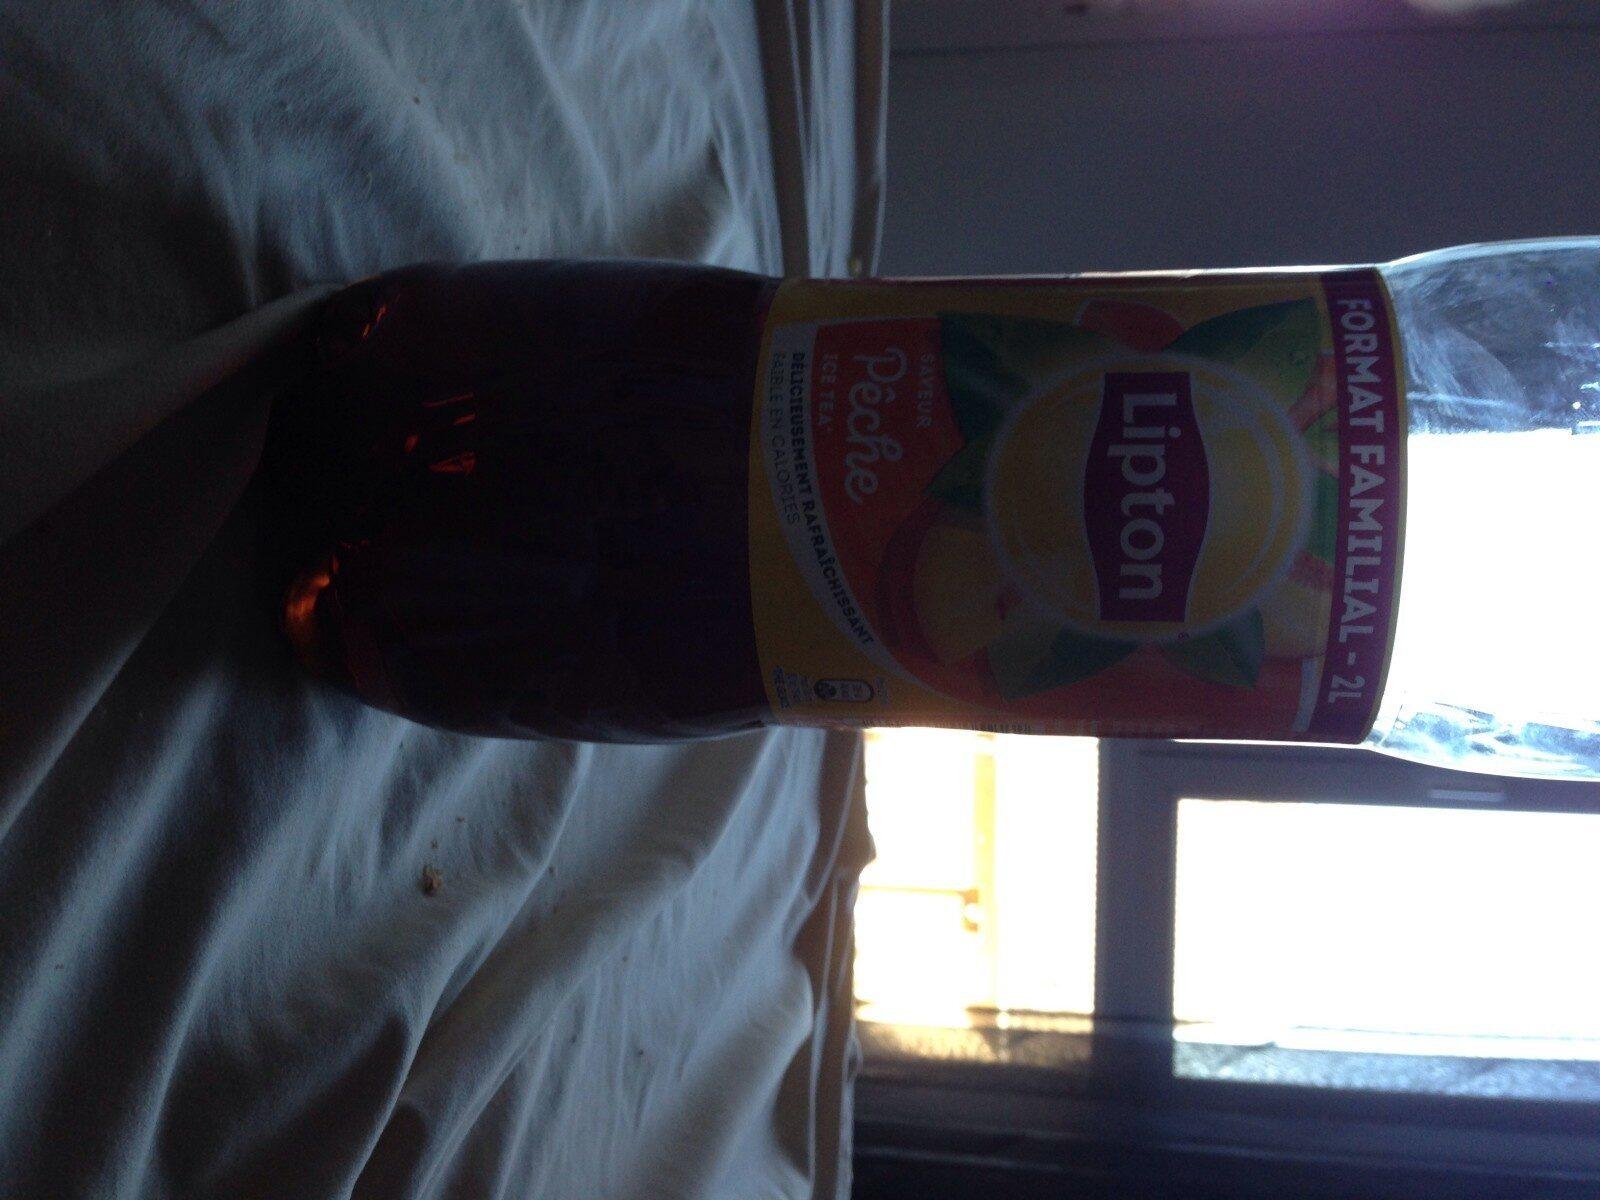 Lipton Ice Tea saveur pêche format familial 2 L - Valori nutrizionali - fr